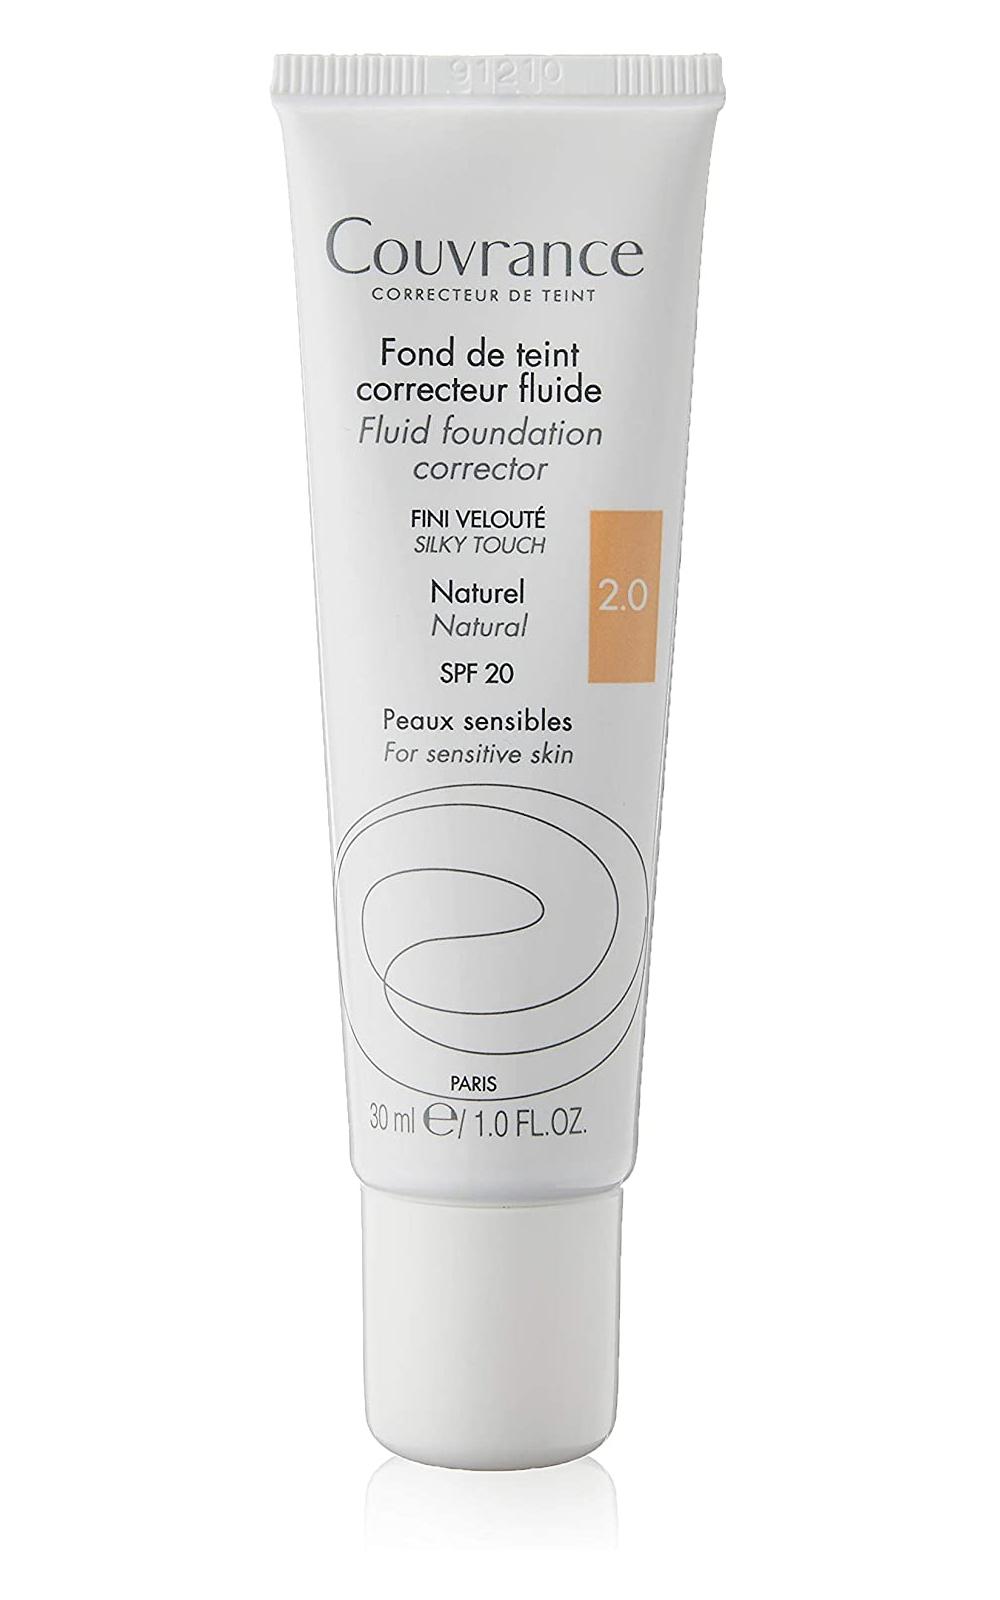 Pieles sensibles: Couvrance Fondo de Maquillaje Corrector Fluido de Avène.